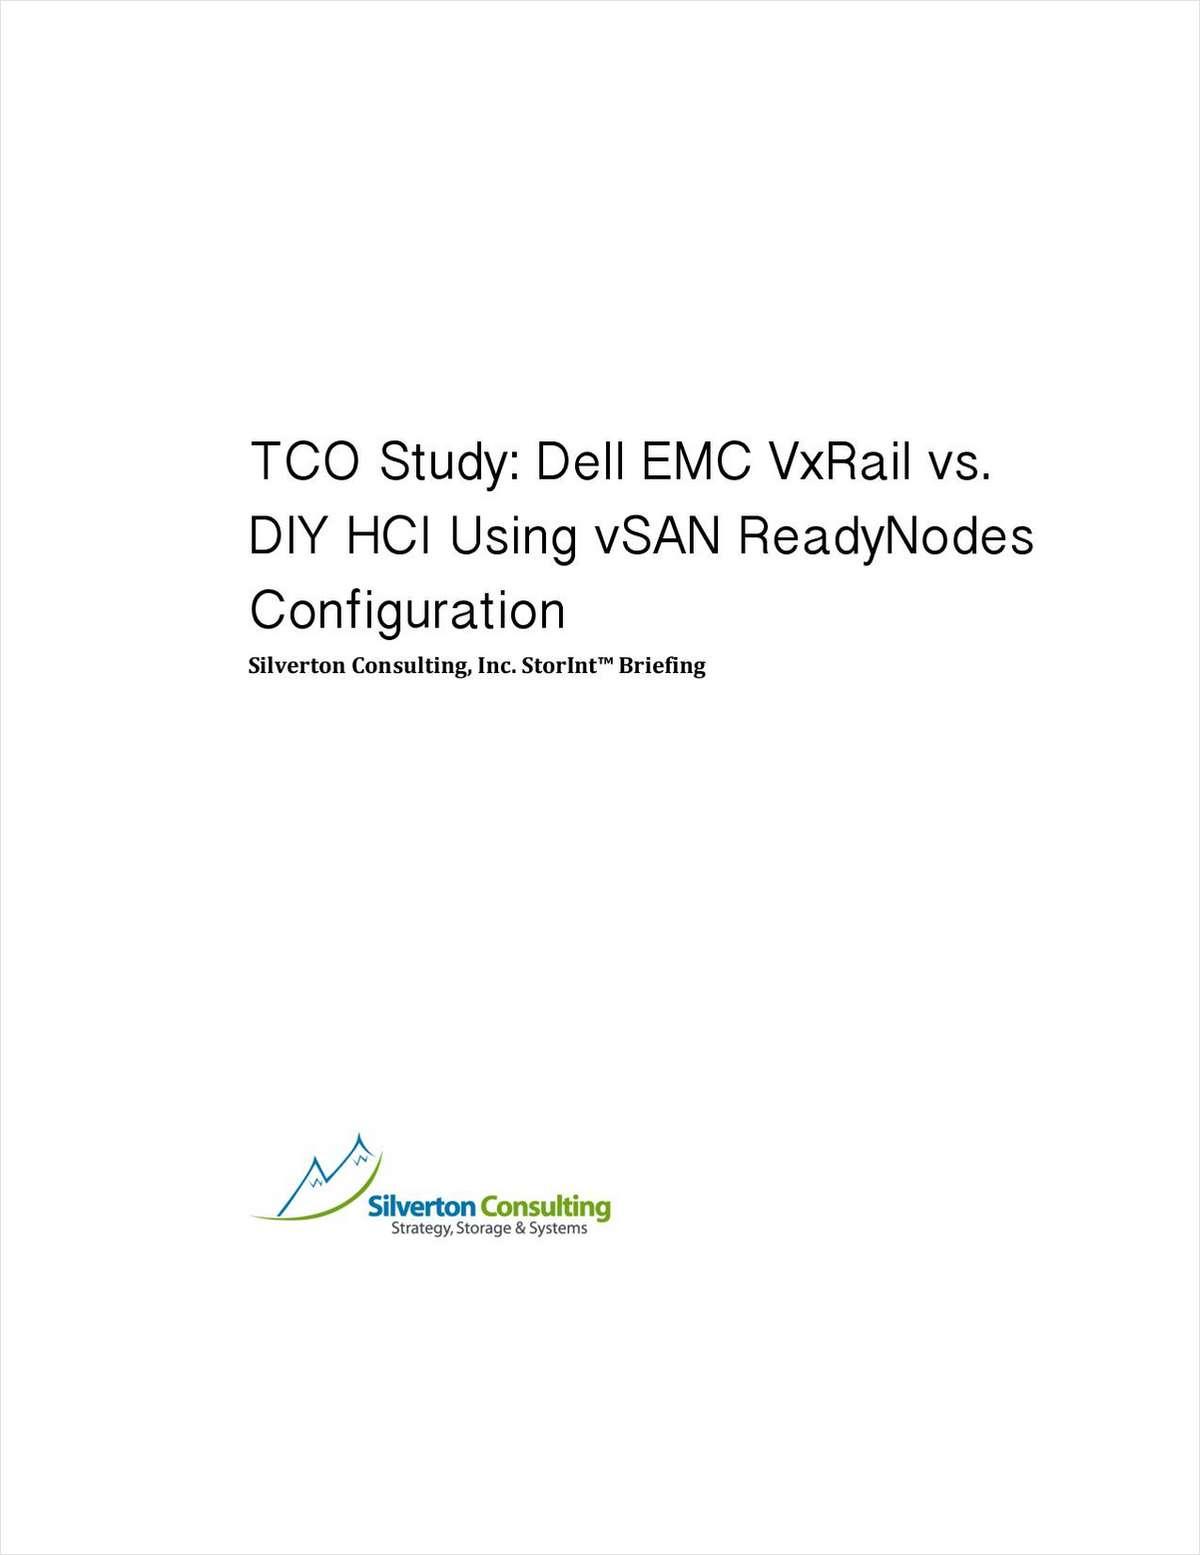 TCO Study: Dell EMC VxRail vs. DIY HCI Using vSAN Readynodes Configuration